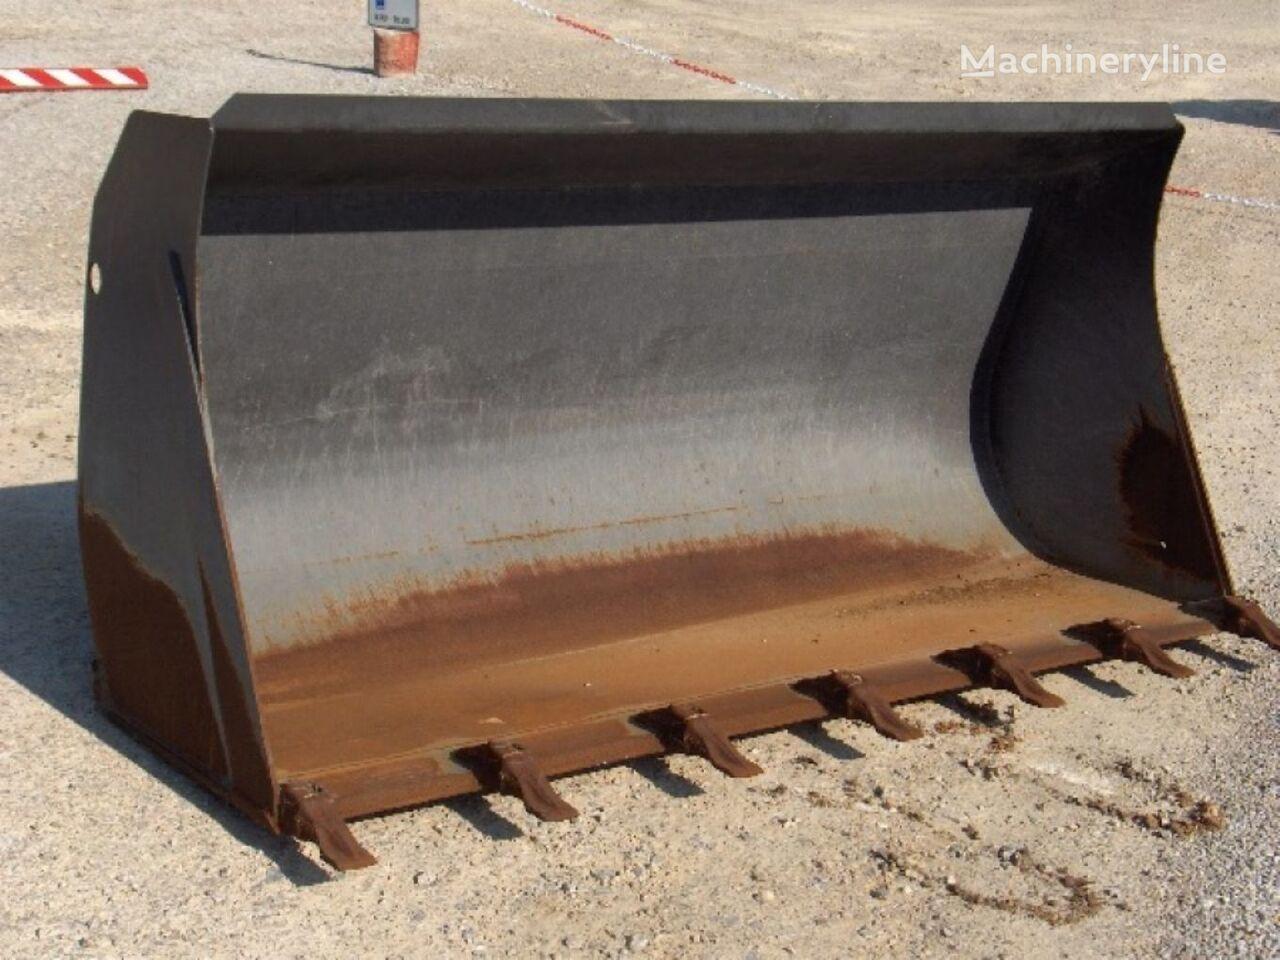 BUCKET WITH TEETH 1MC Lungh.1900mm front loader bucket